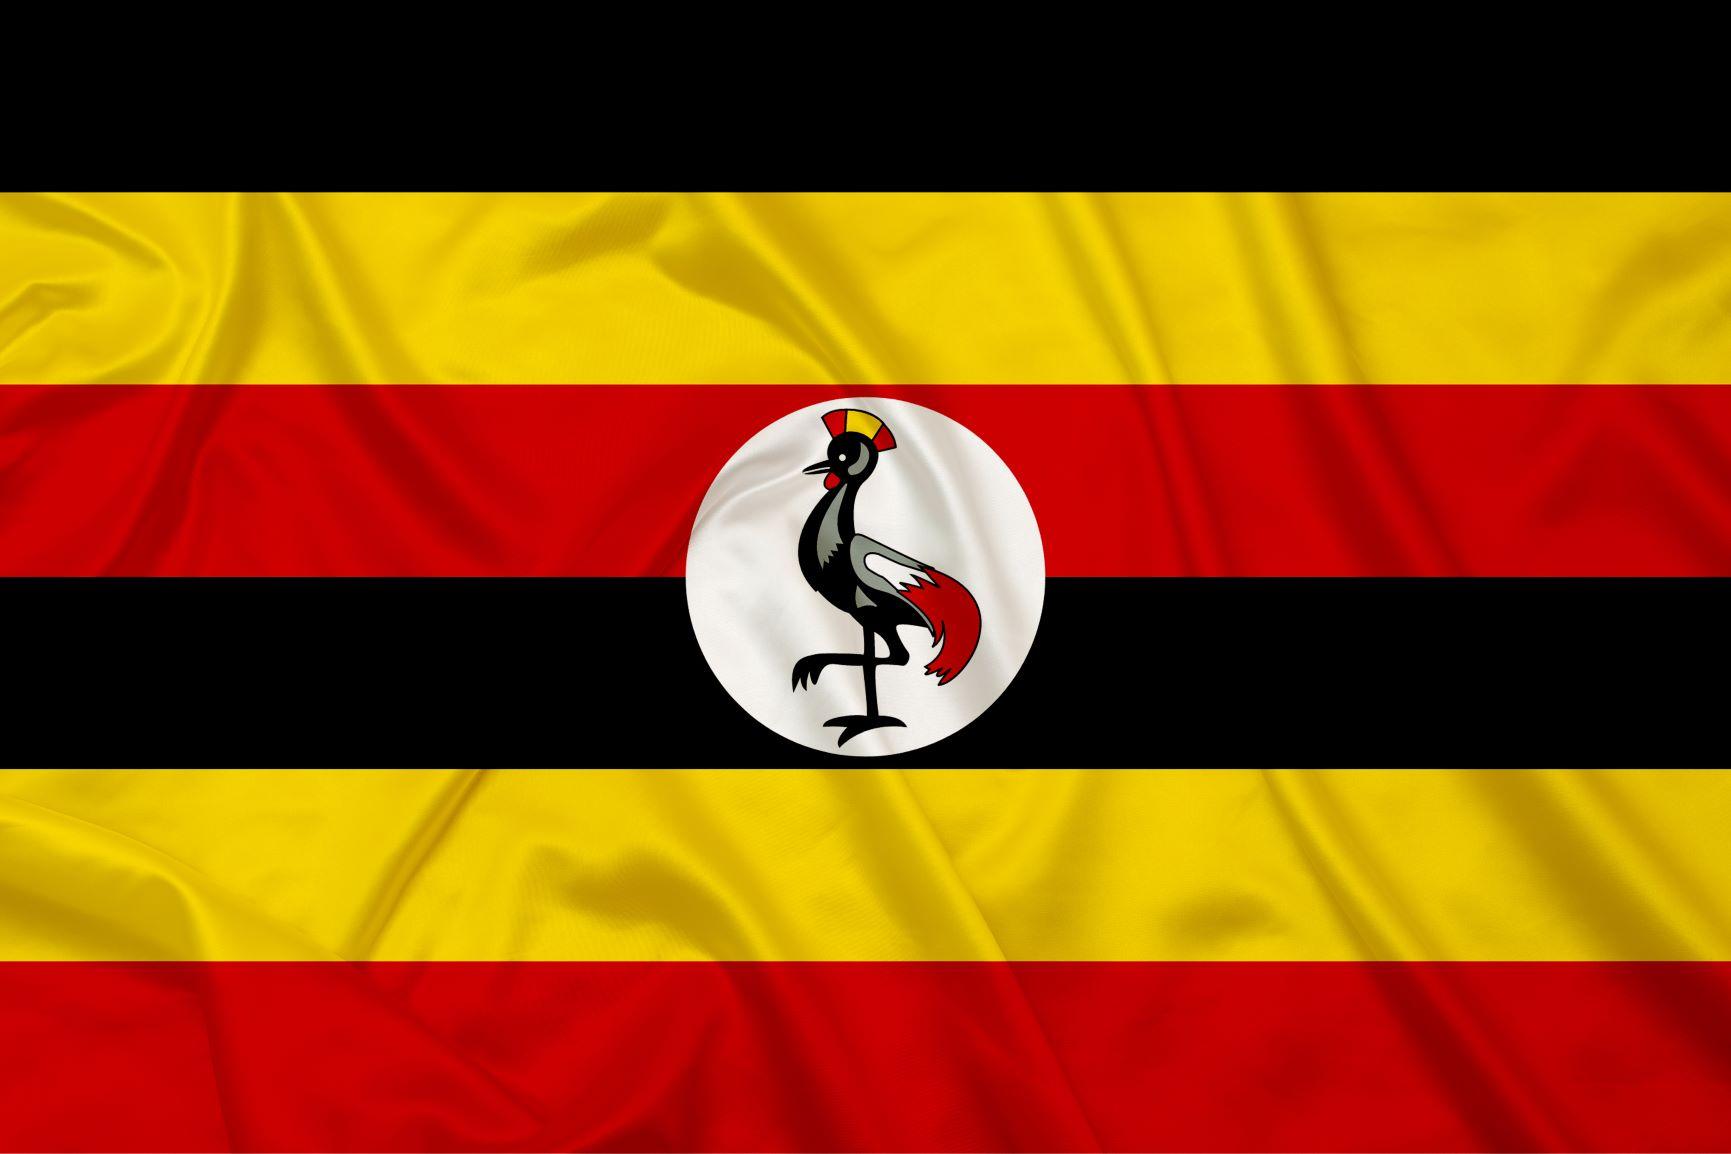 Uganda: President Museveni, ruling NRM set to win general elections on 14 Jan